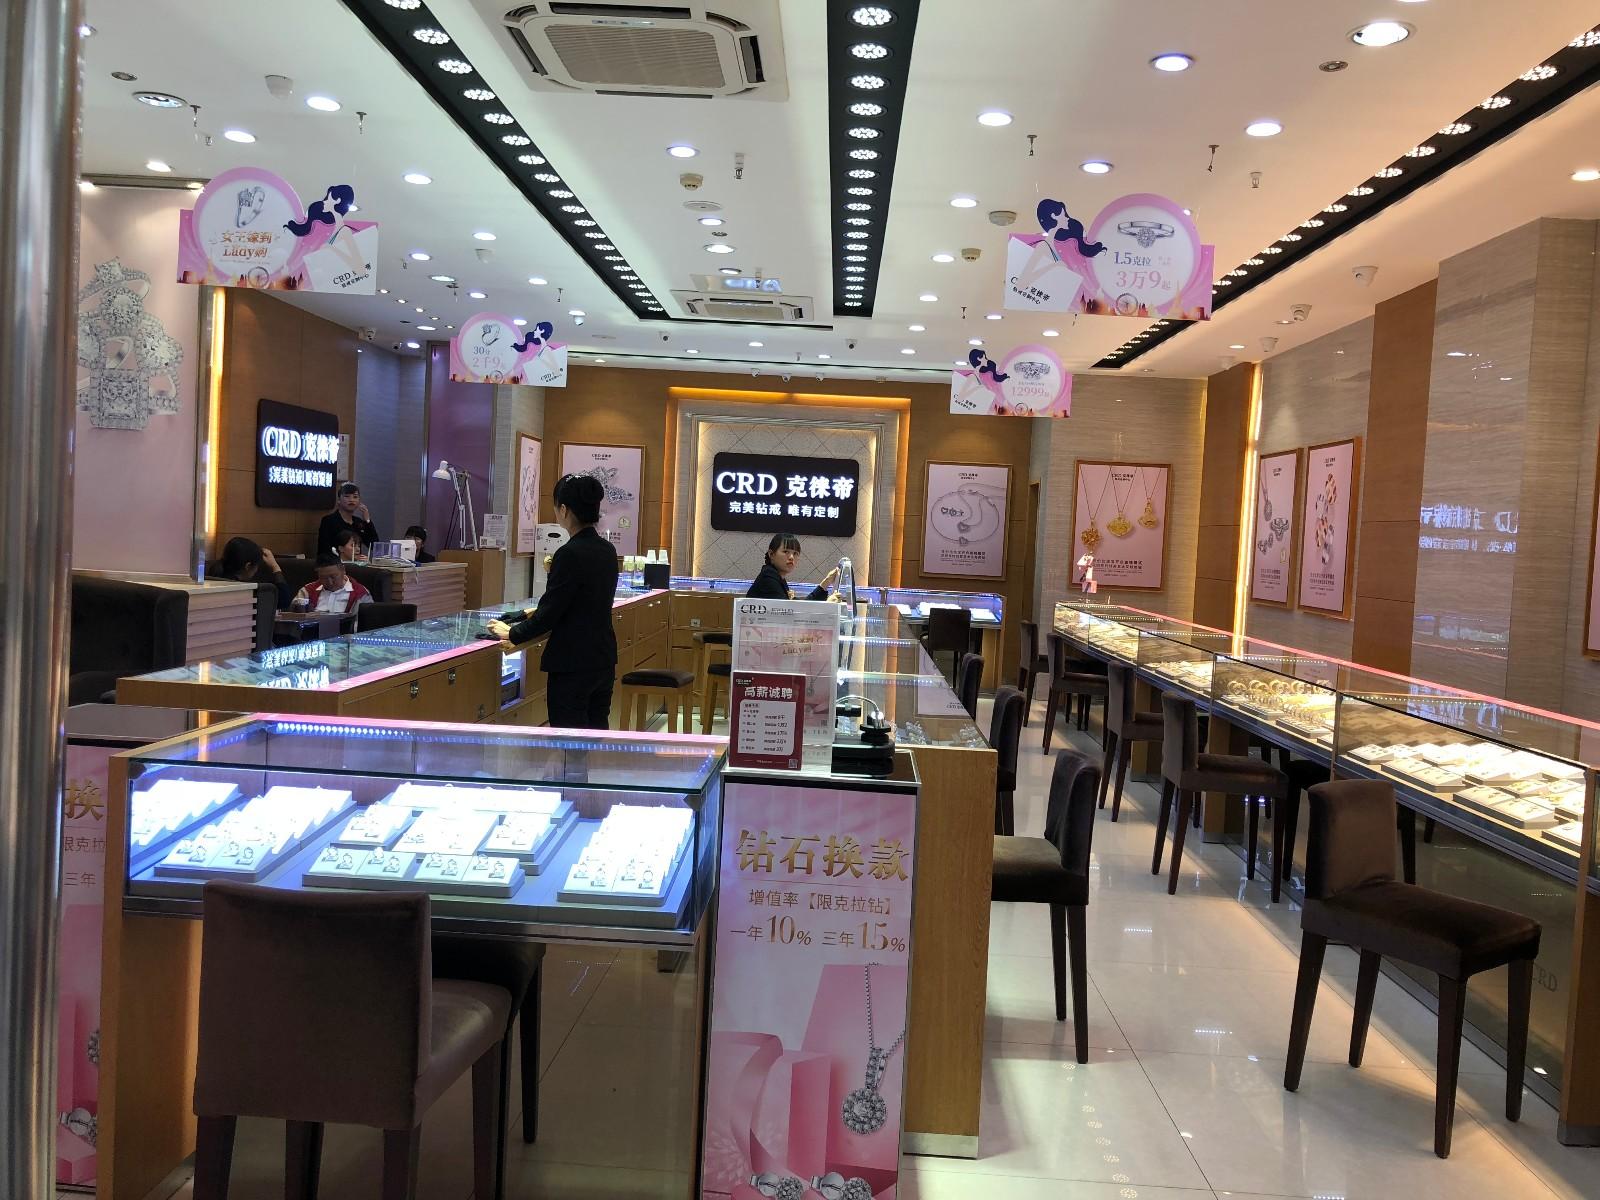 CRD克徕帝厦门中山路店